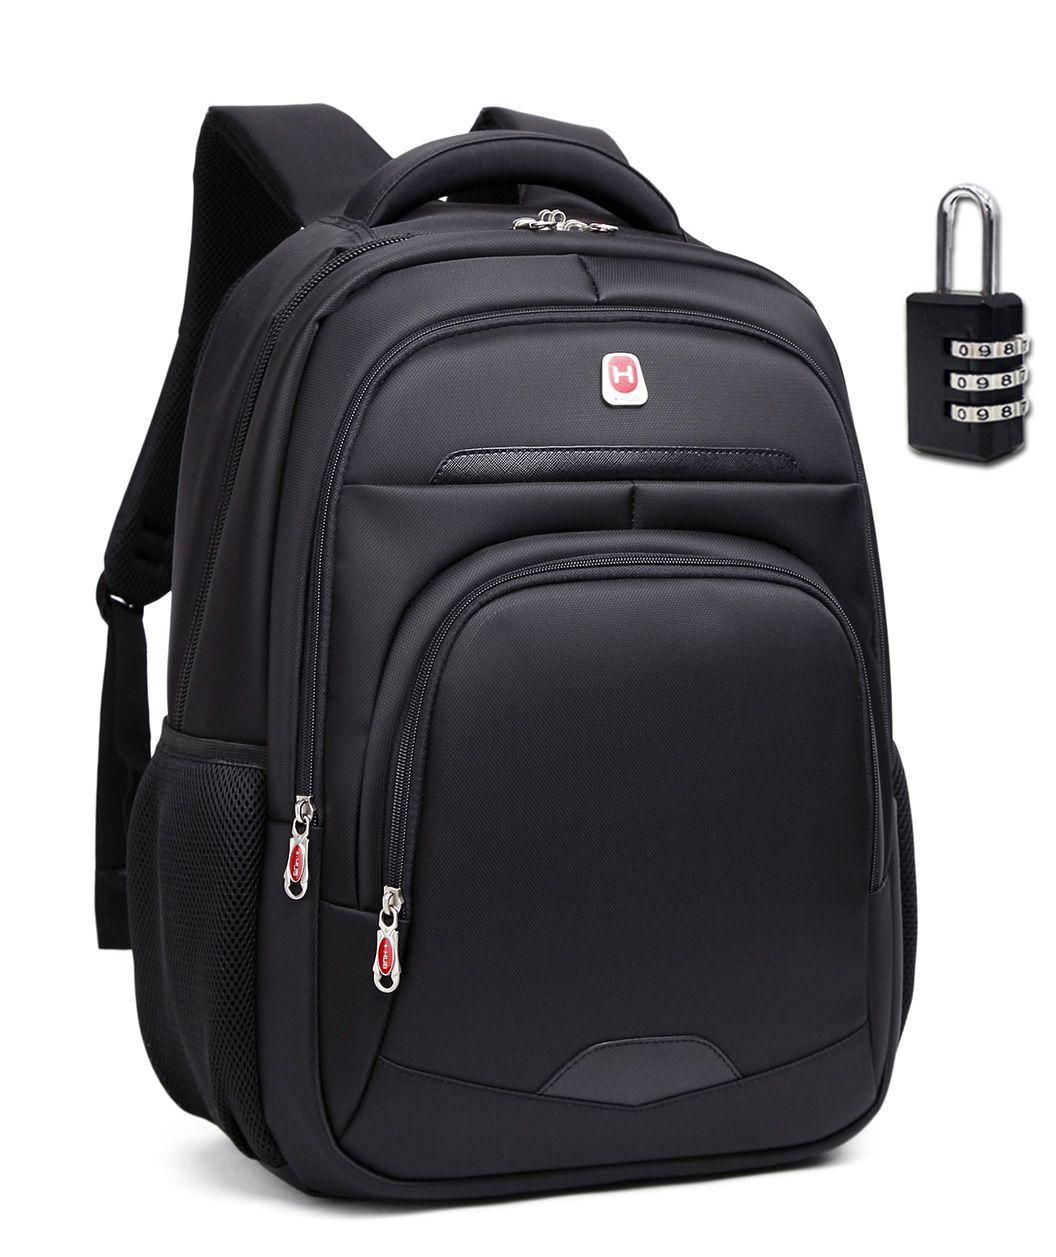 Mochila Notebook Hub H119 Reforçada 30L Preta C/ Cadeado